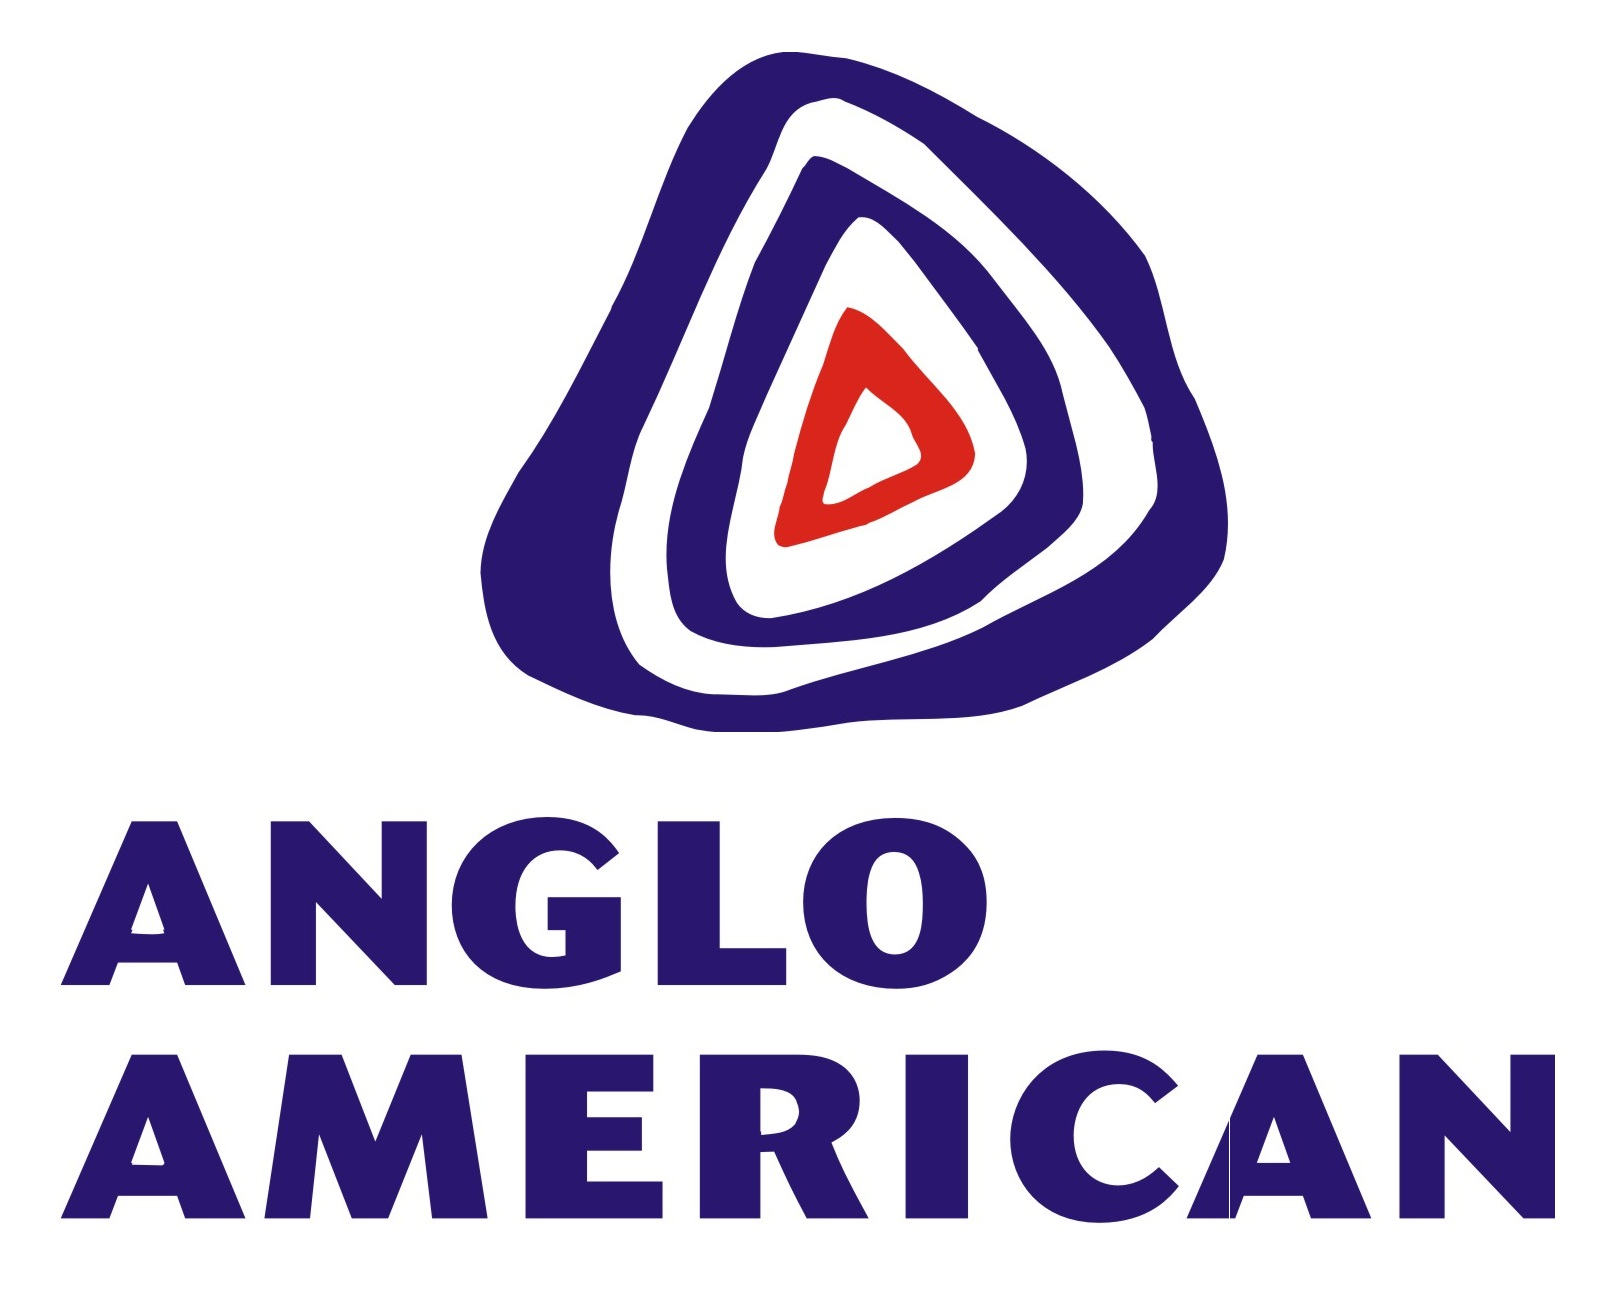 anglo-american-logo-wallpaper.jpg